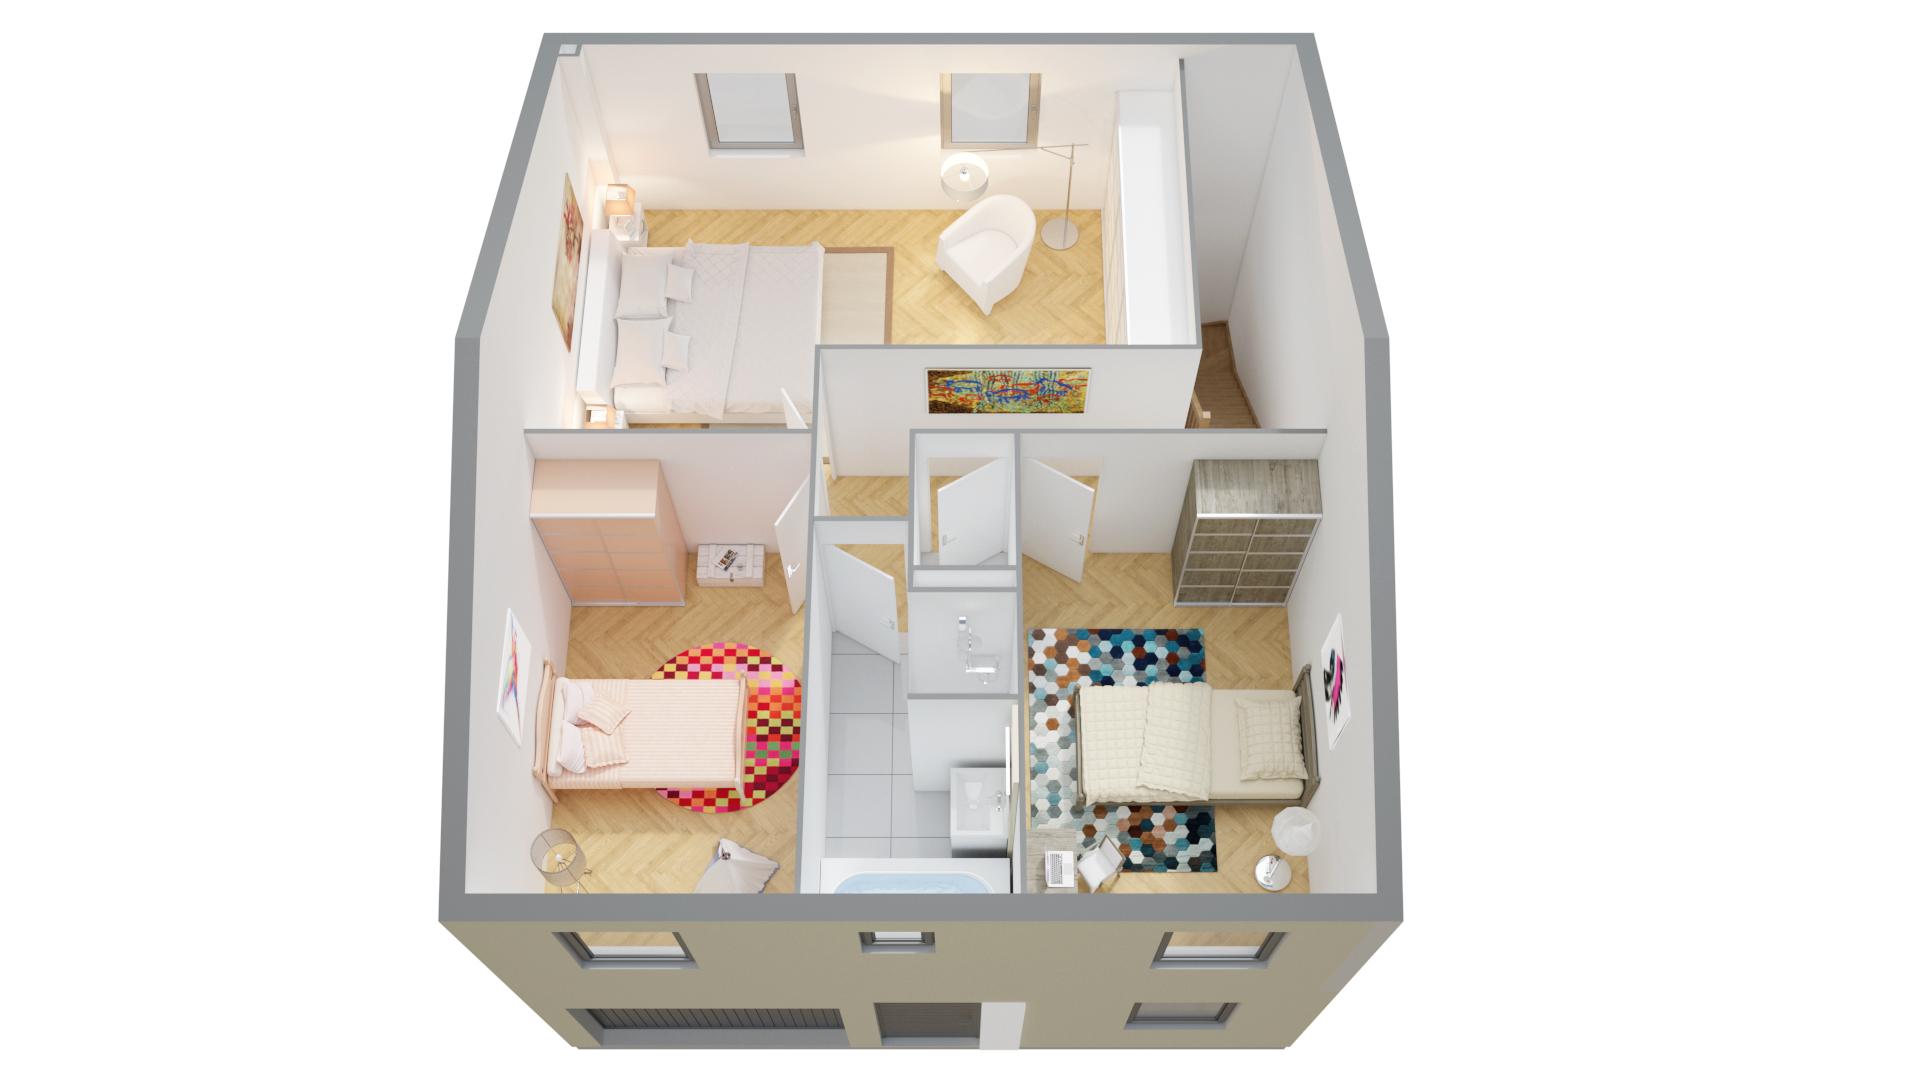 Plan de maison un etage avec garage ventana blog - Plan etage 3 chambres ...